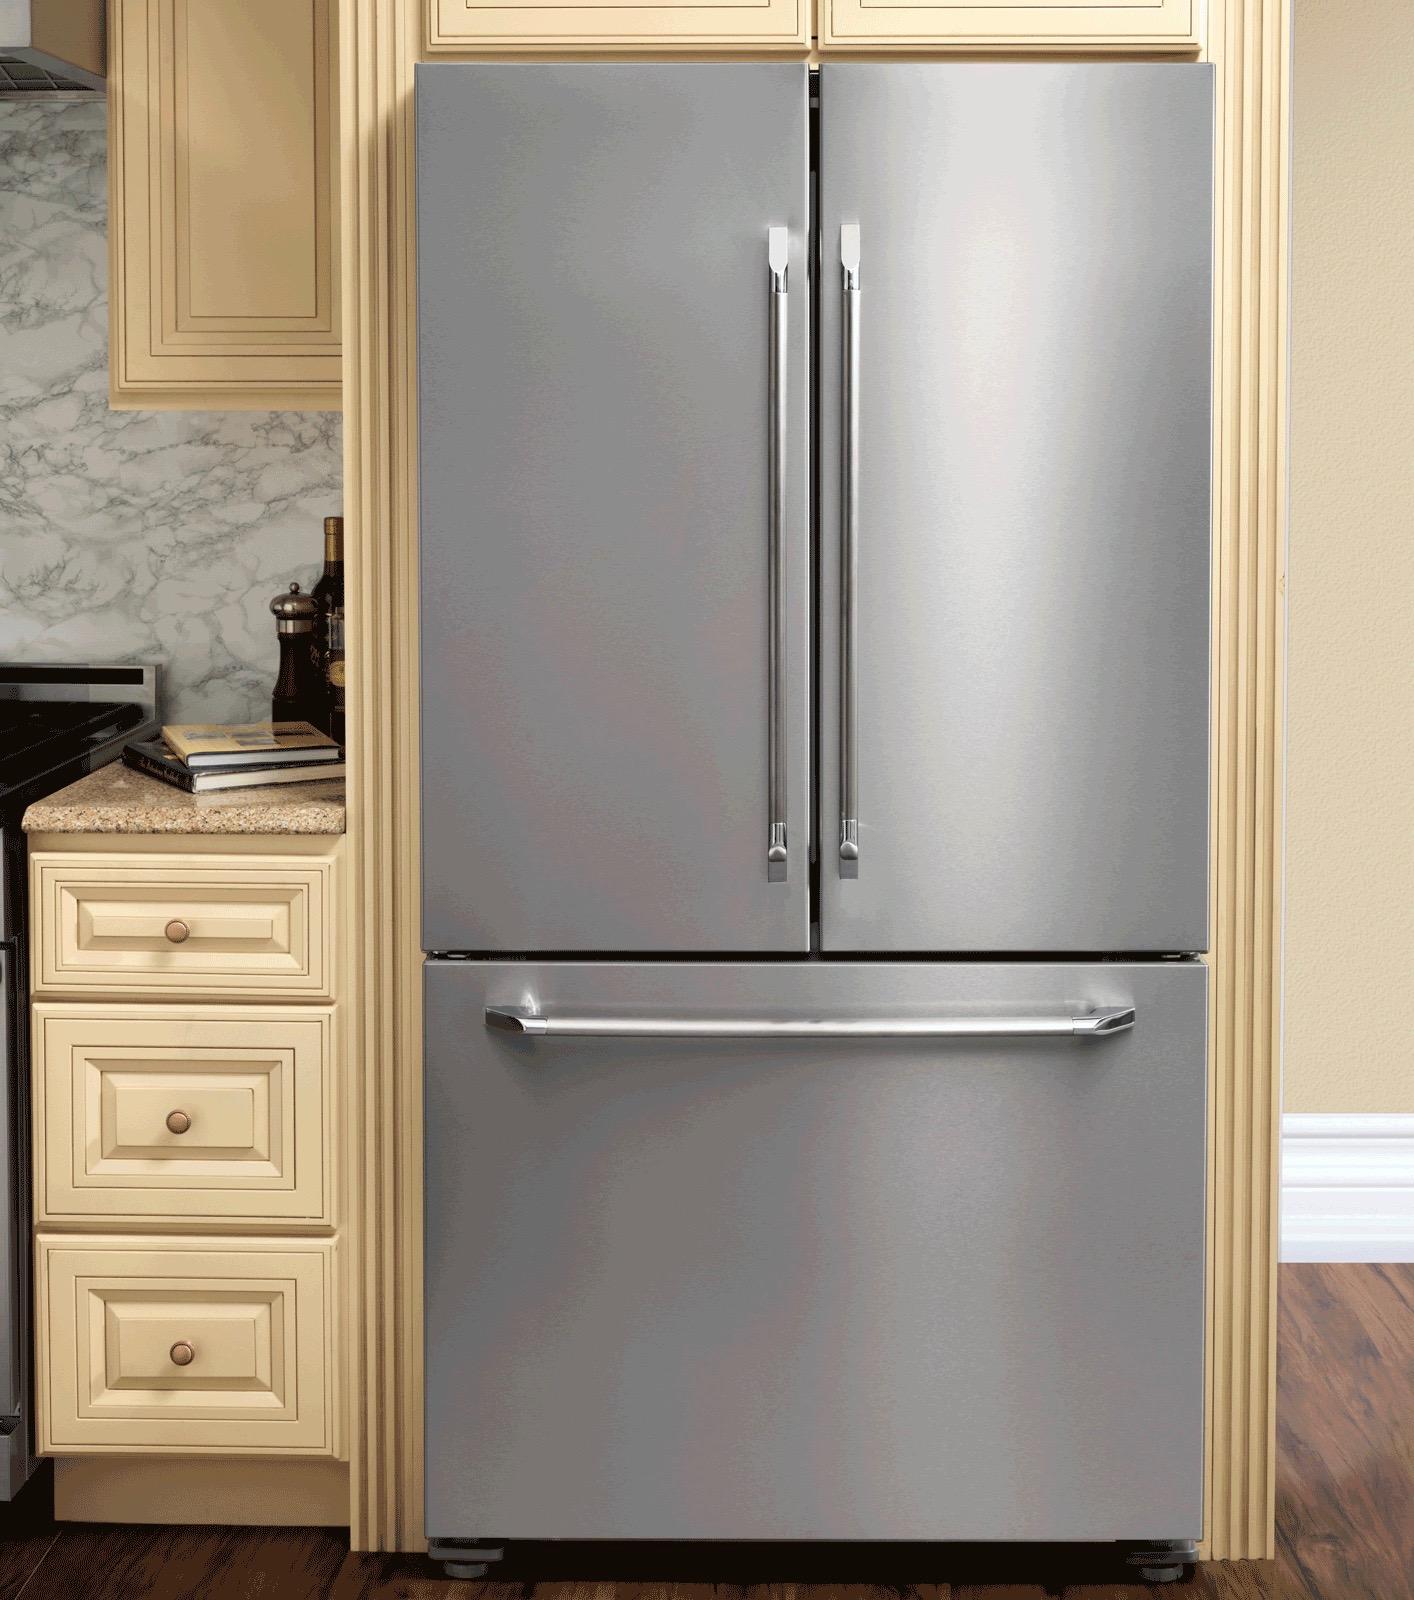 fridgeDTF36FCS_StraightOn_Vignette_Closed_1600x1600_150dpi